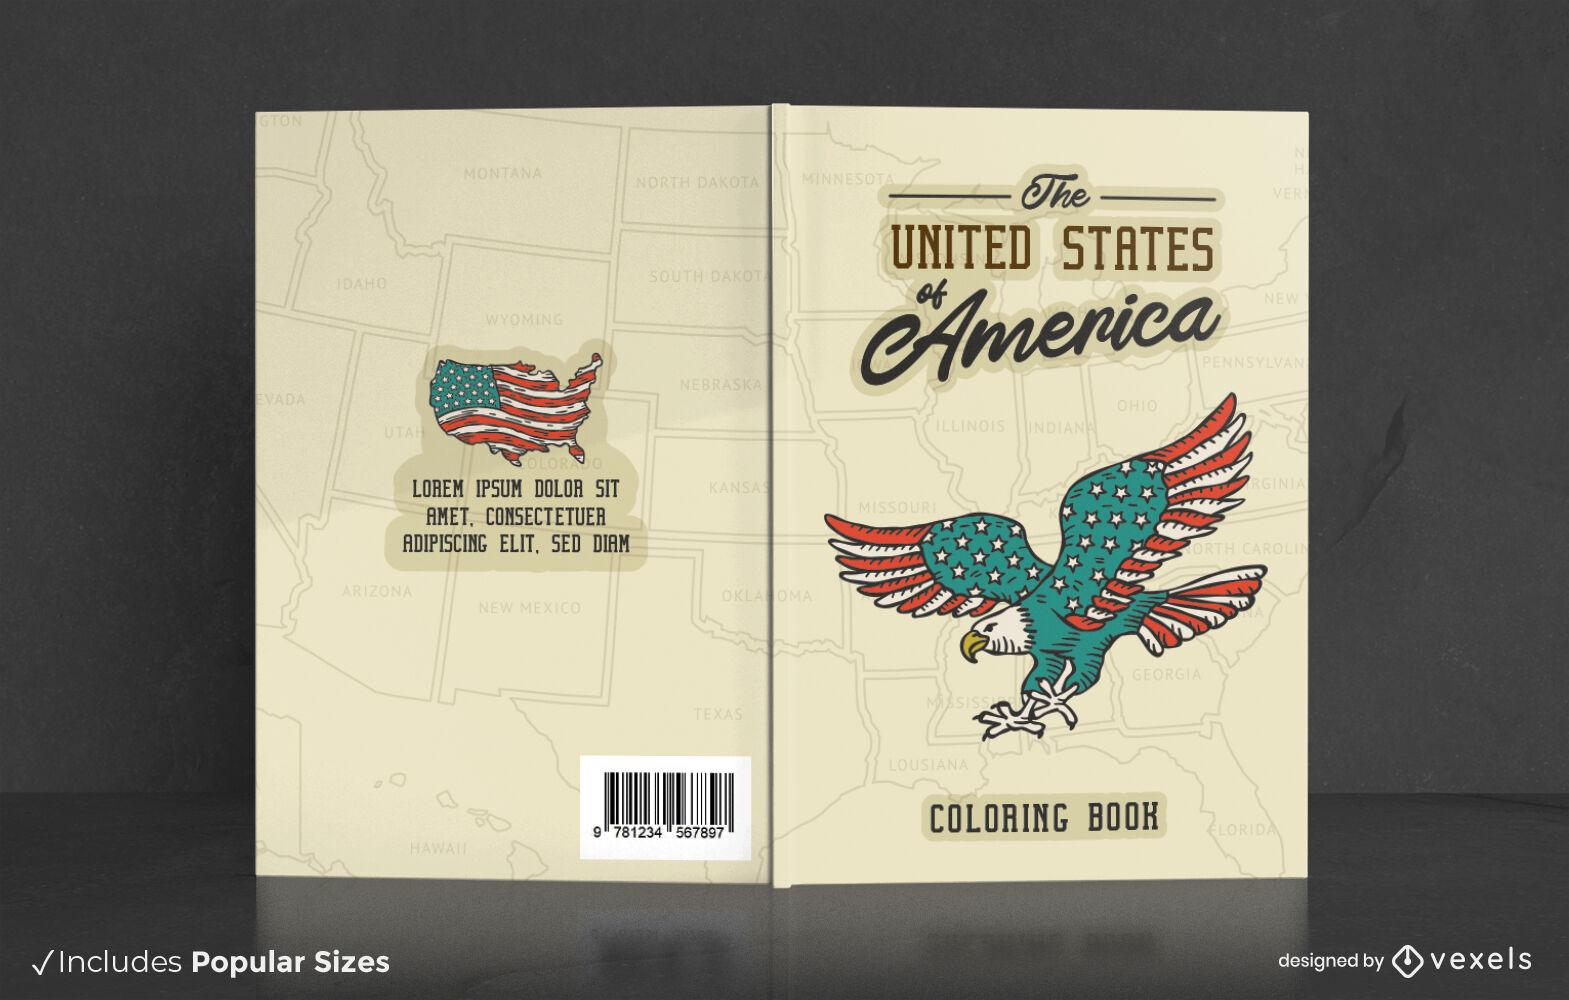 USA-Malbuch-Cover-Design